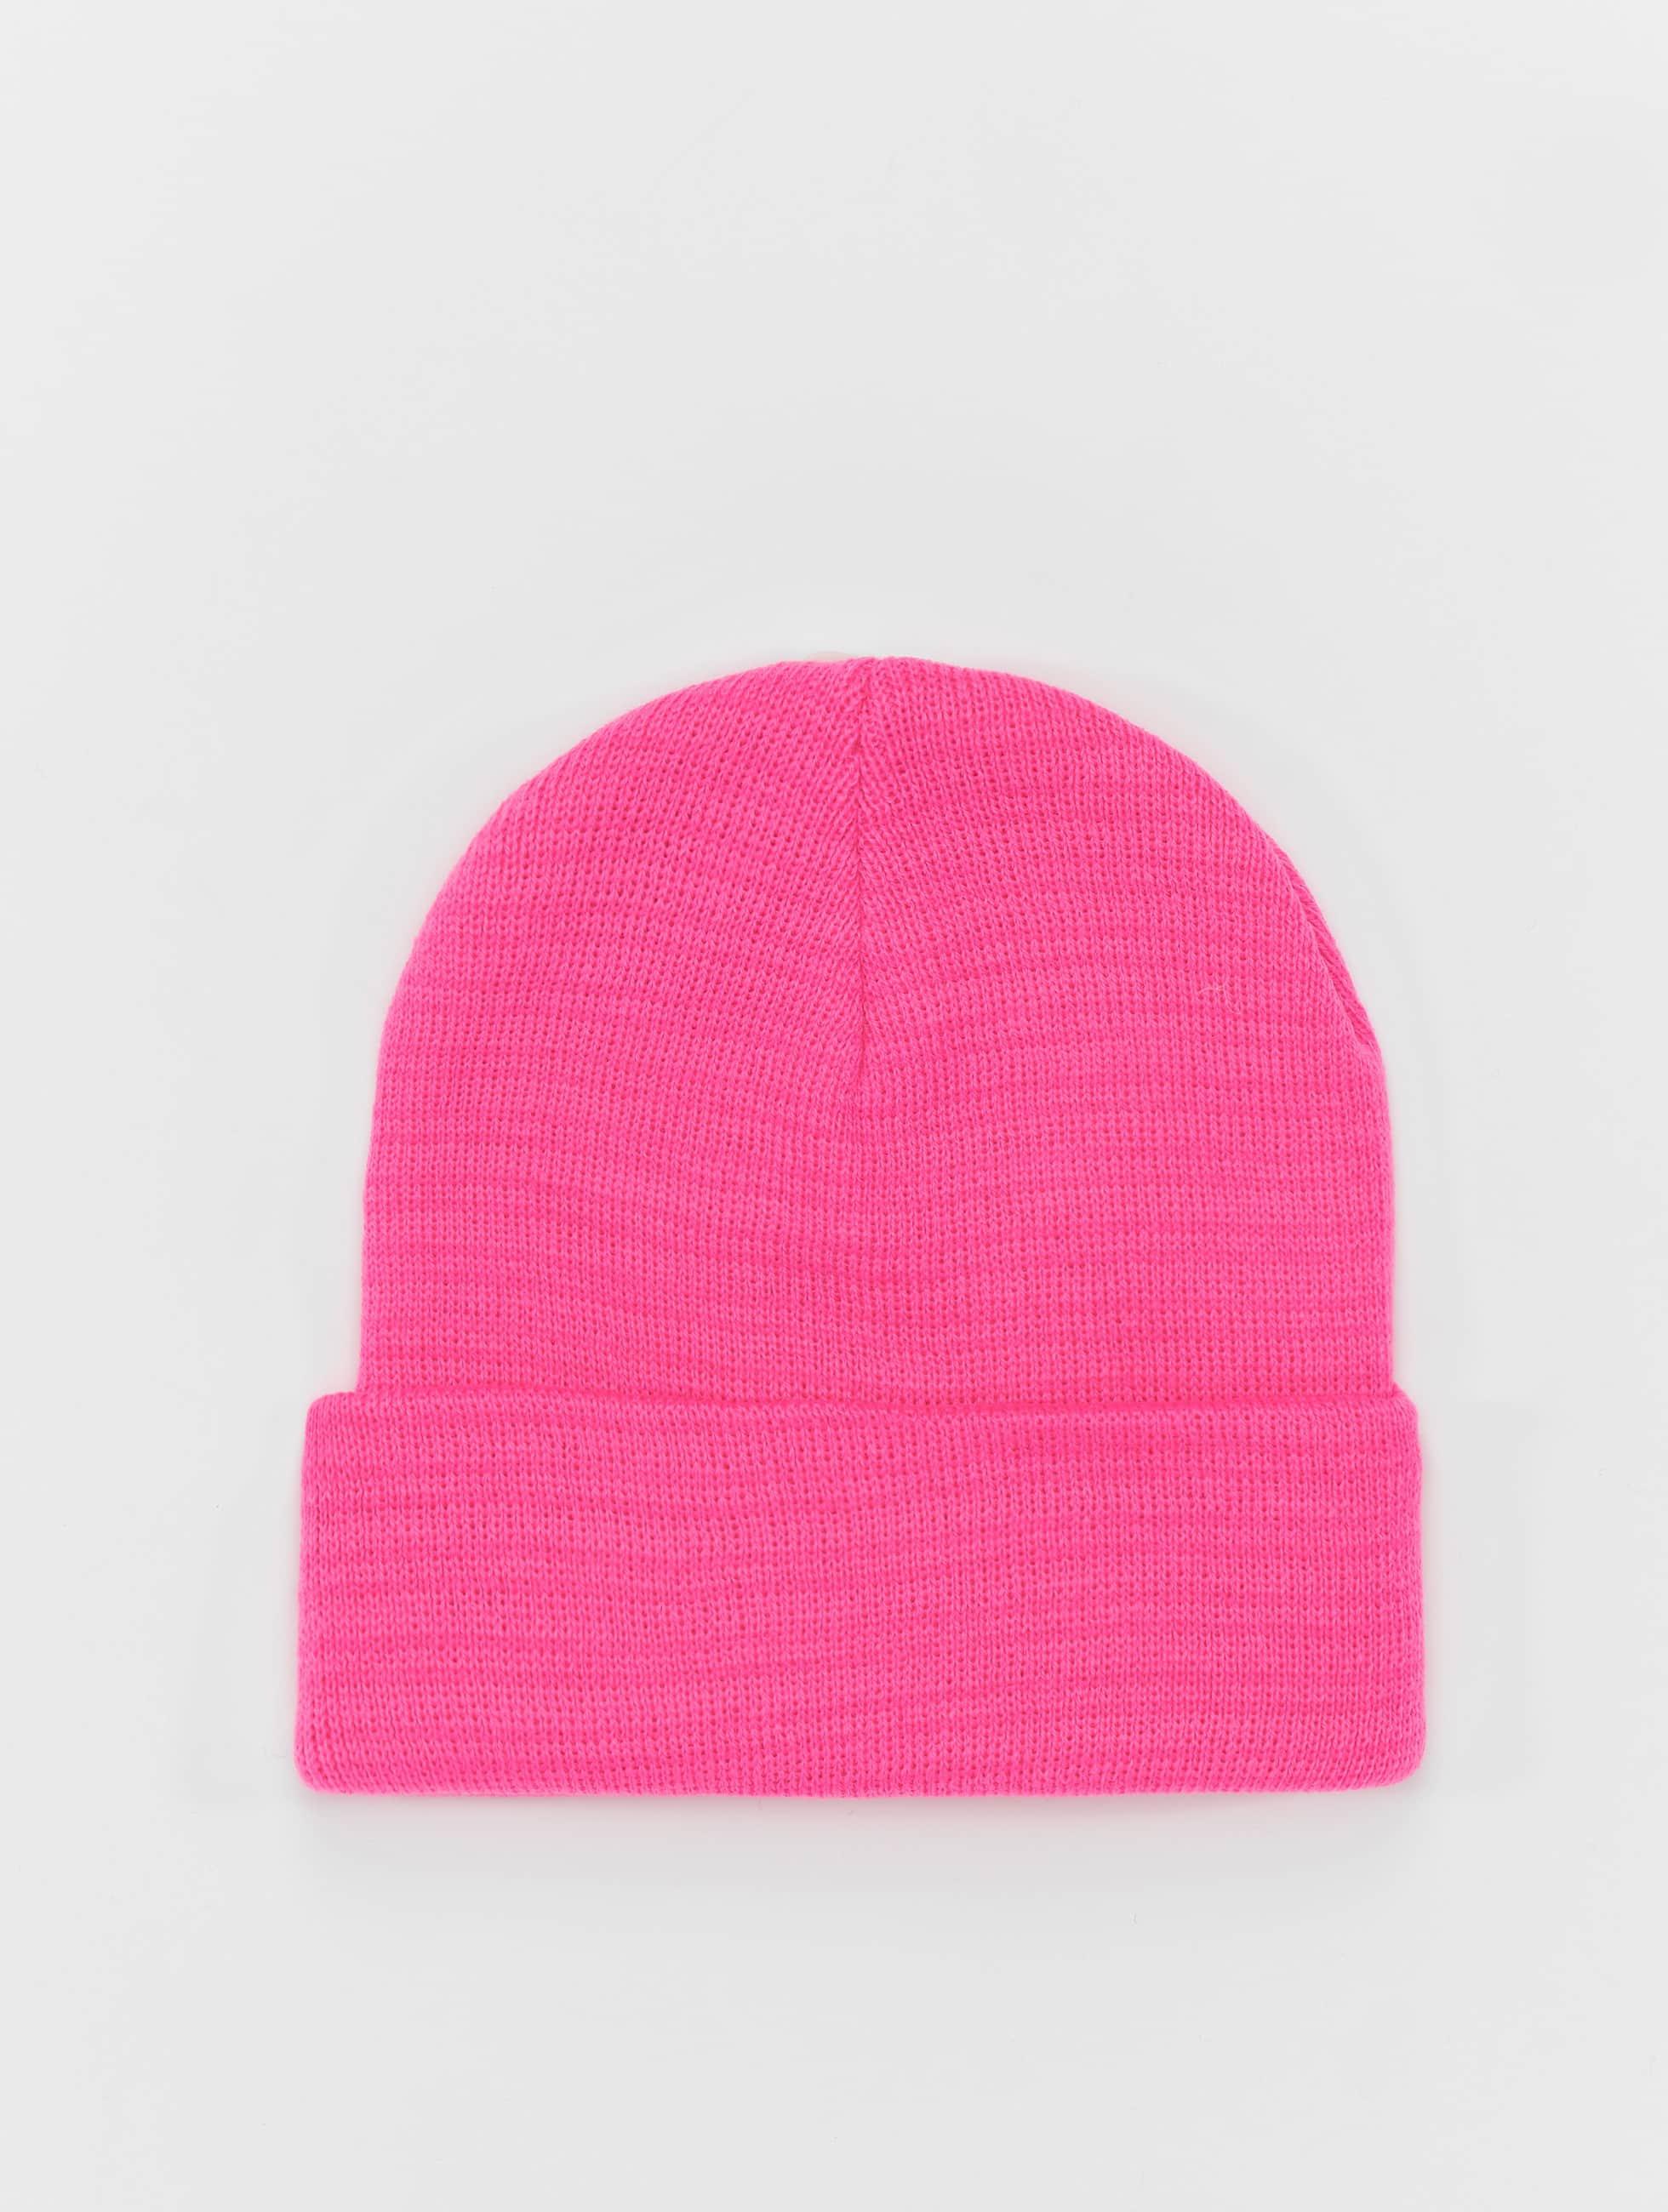 Beanie Basic Flap in pink